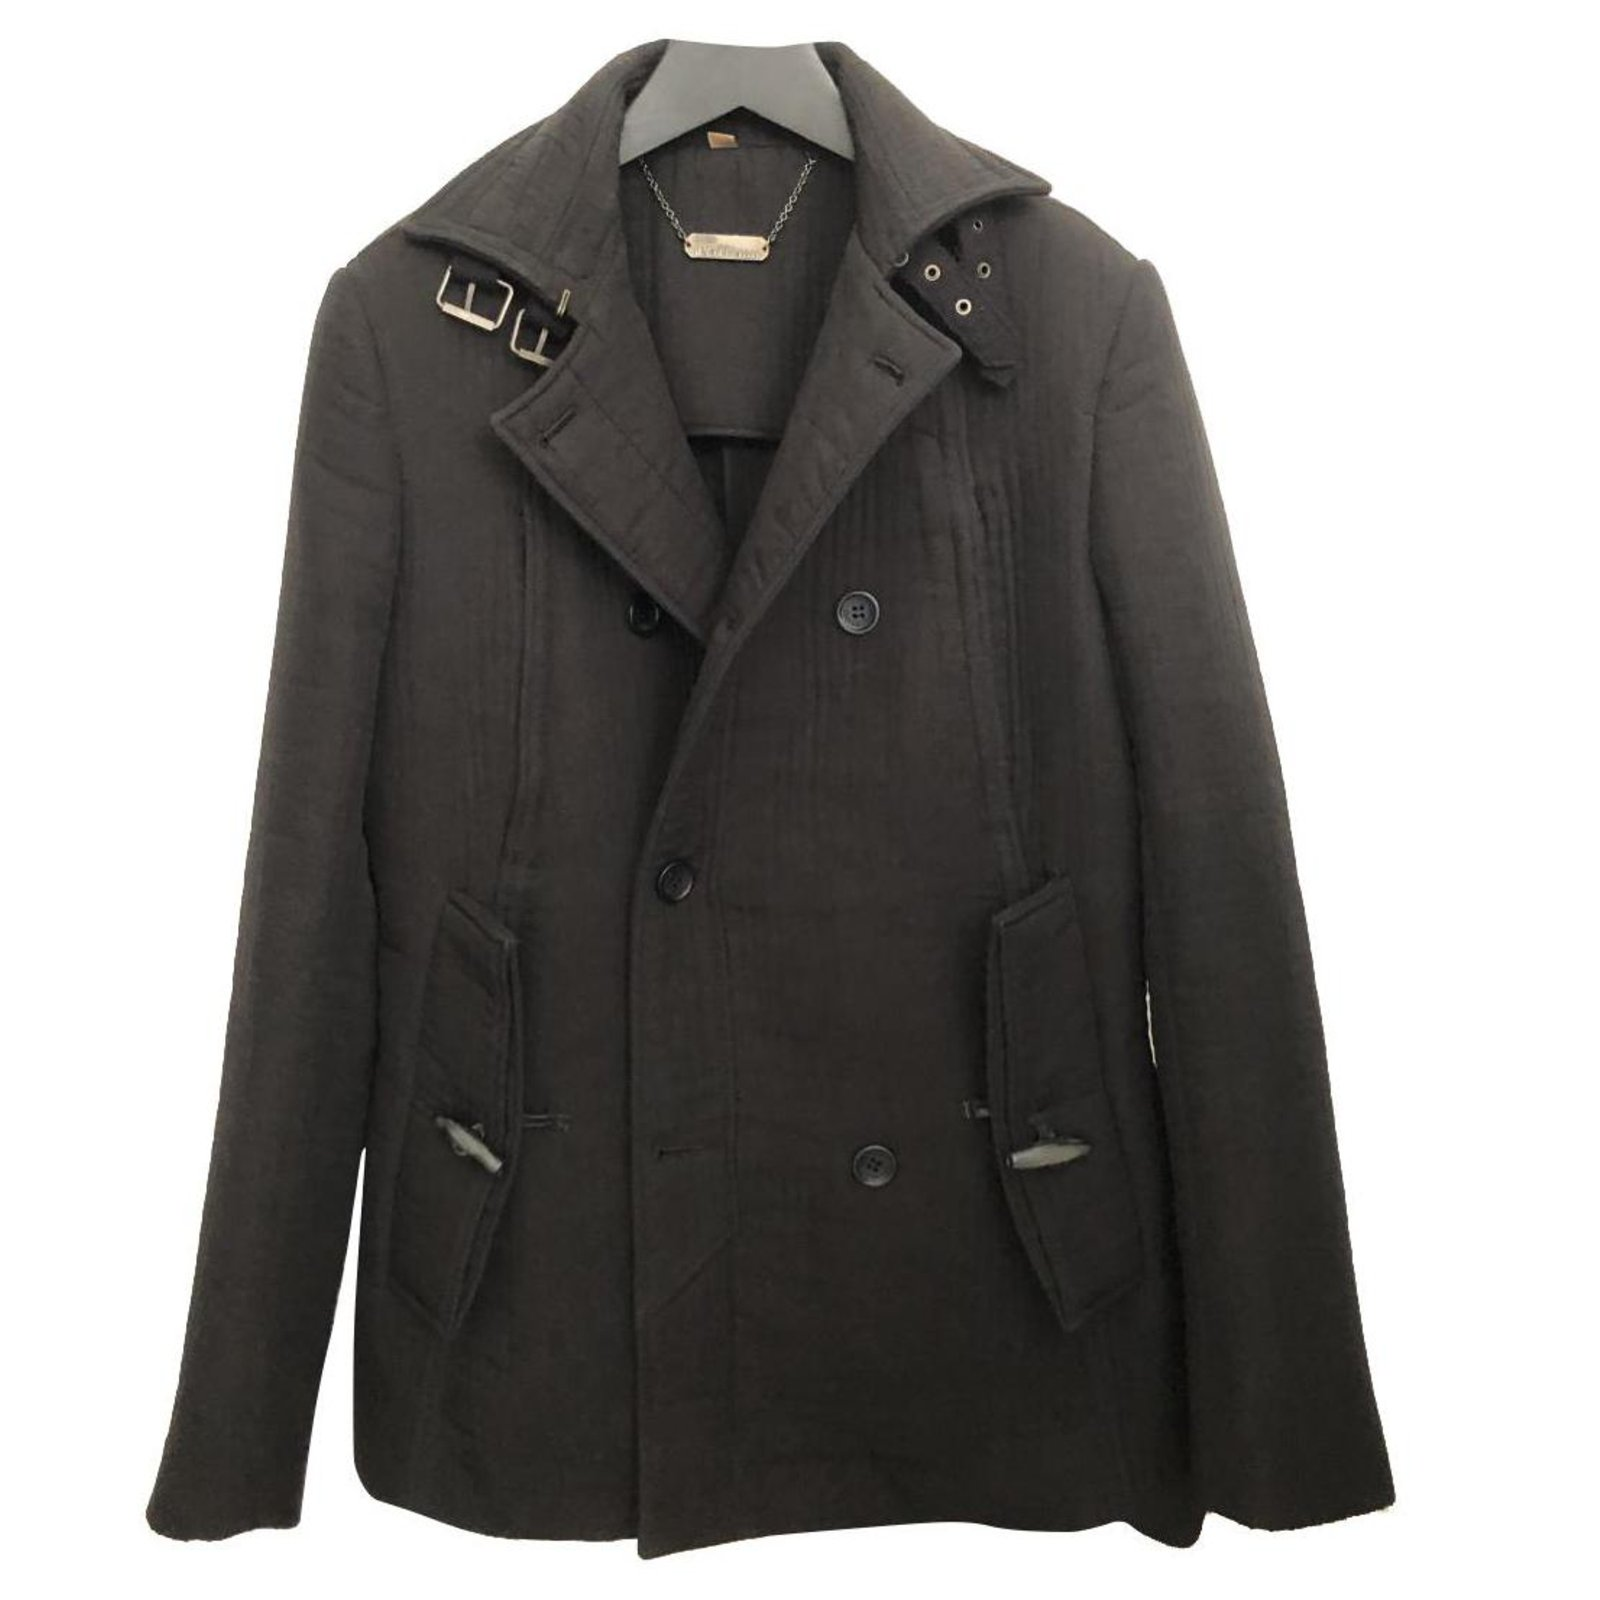 Very Nice Black Quilted Cotton Pea Coat, Black Cotton Pea Coat